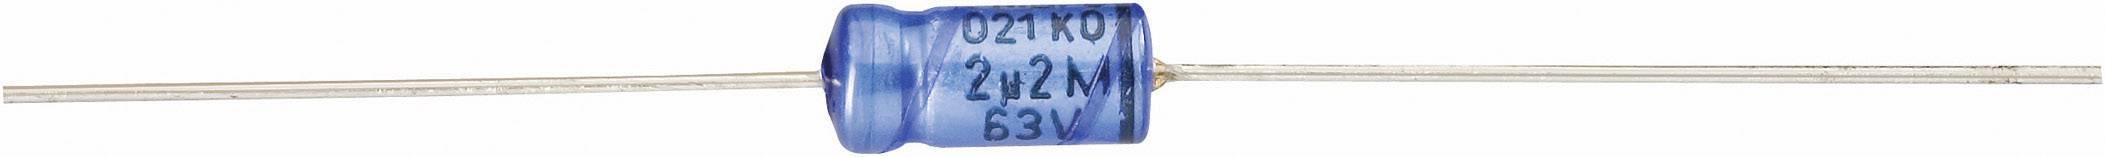 Axiální kondenzátor elektrolytický Vishay 2222 021 36471, 470 µF, 25 V, 20 %, 18 x 10 mm